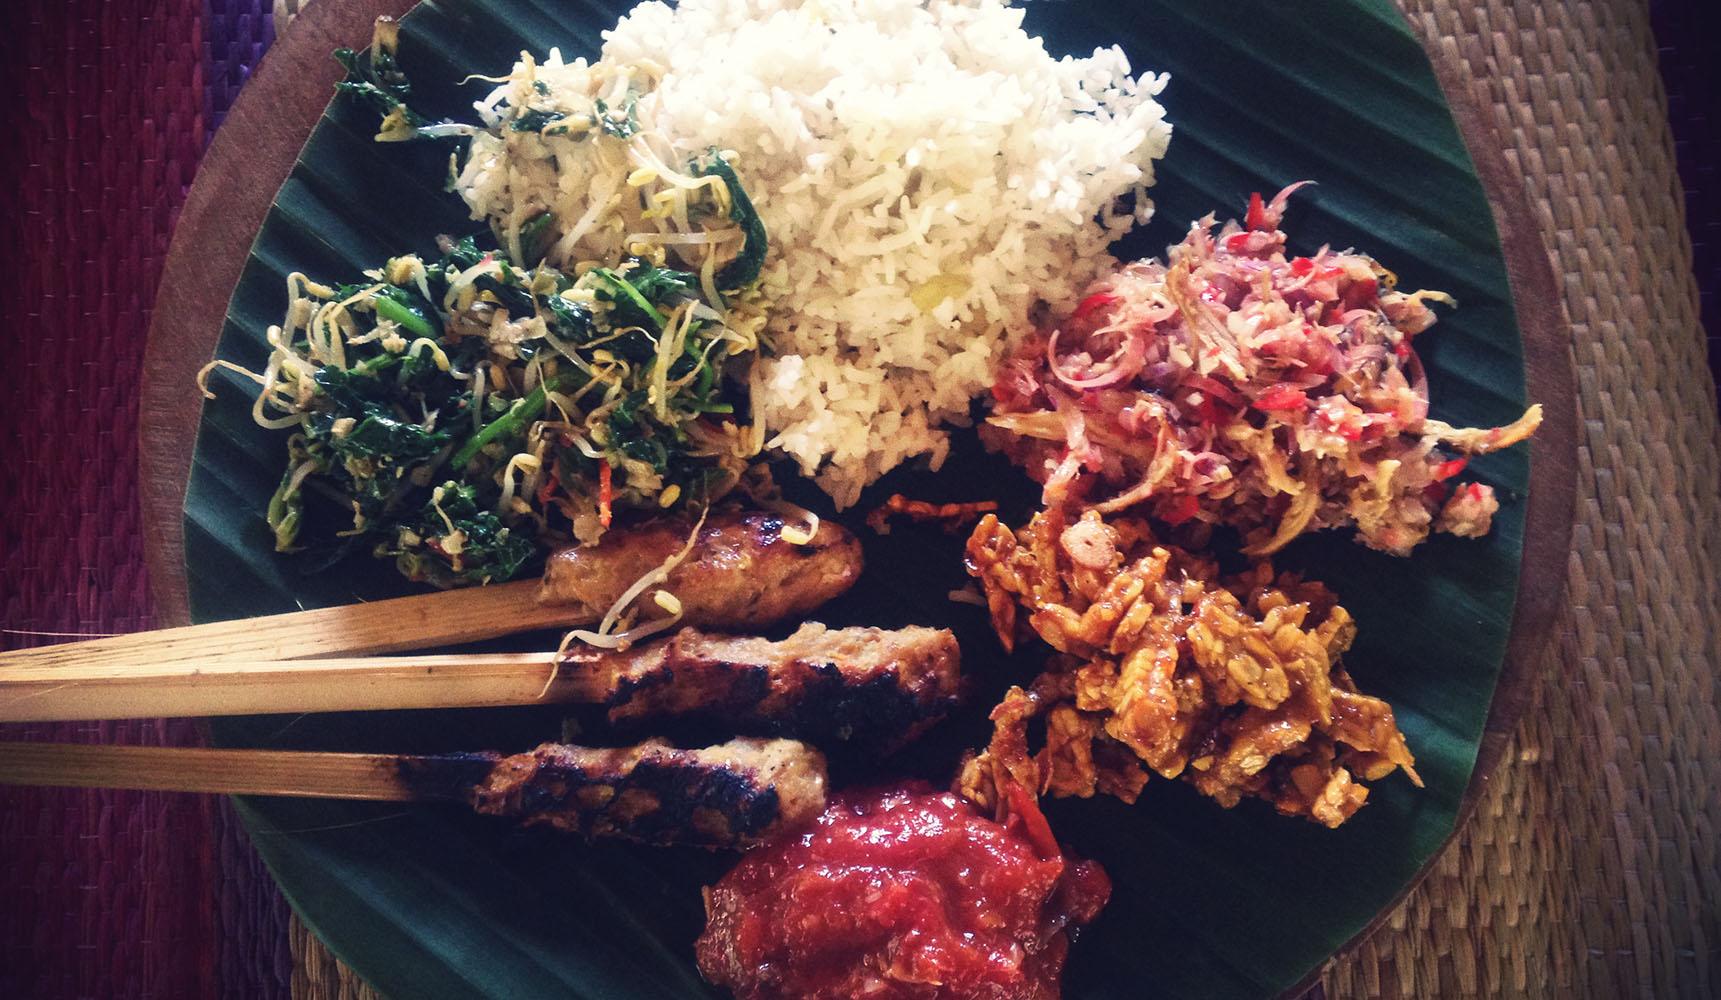 Green Kitchen cooking class sidemen bali indonesia